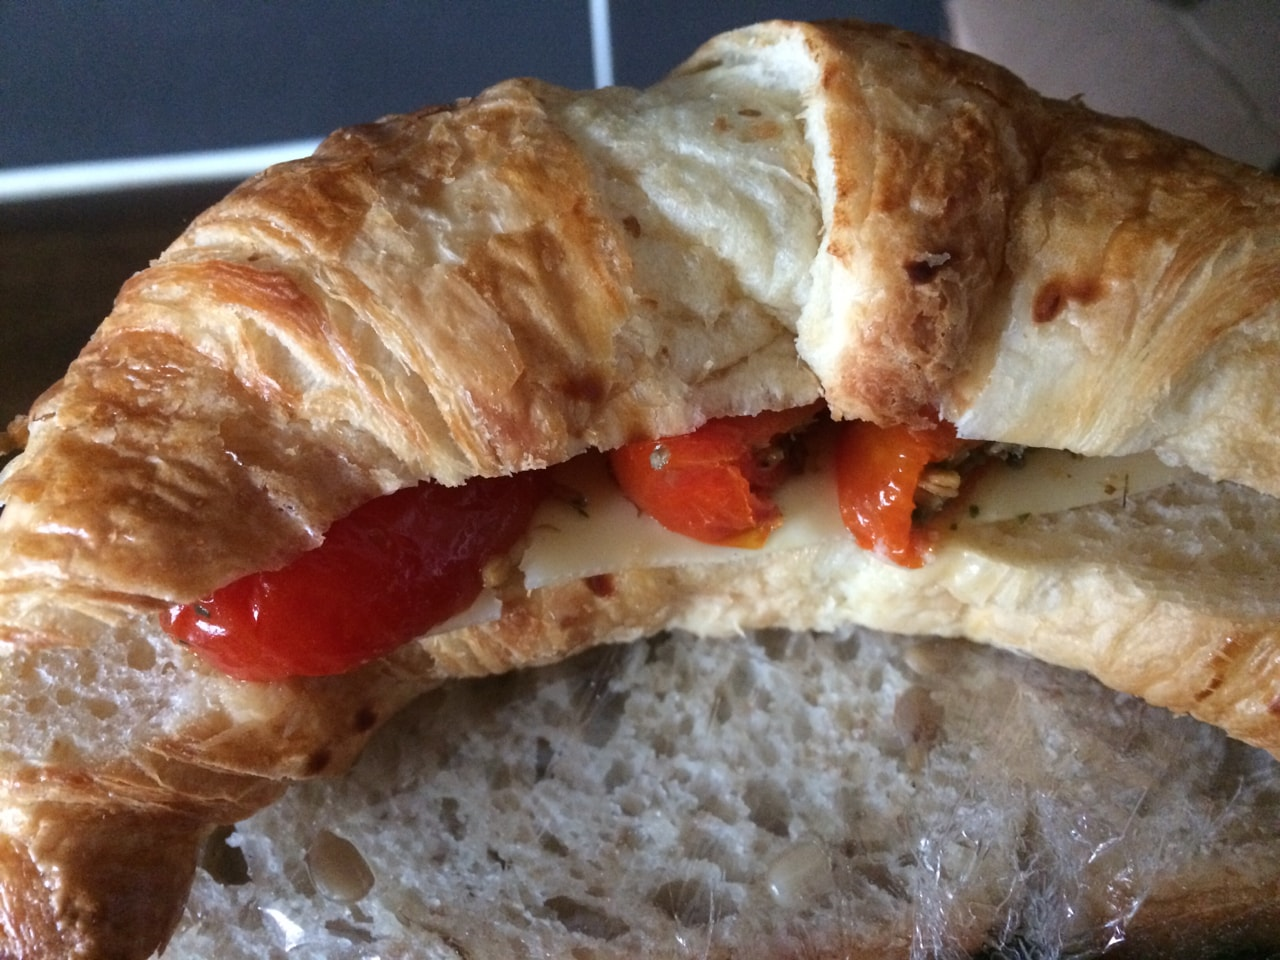 Fresh croissant from Caffe Nero Globen 7/9